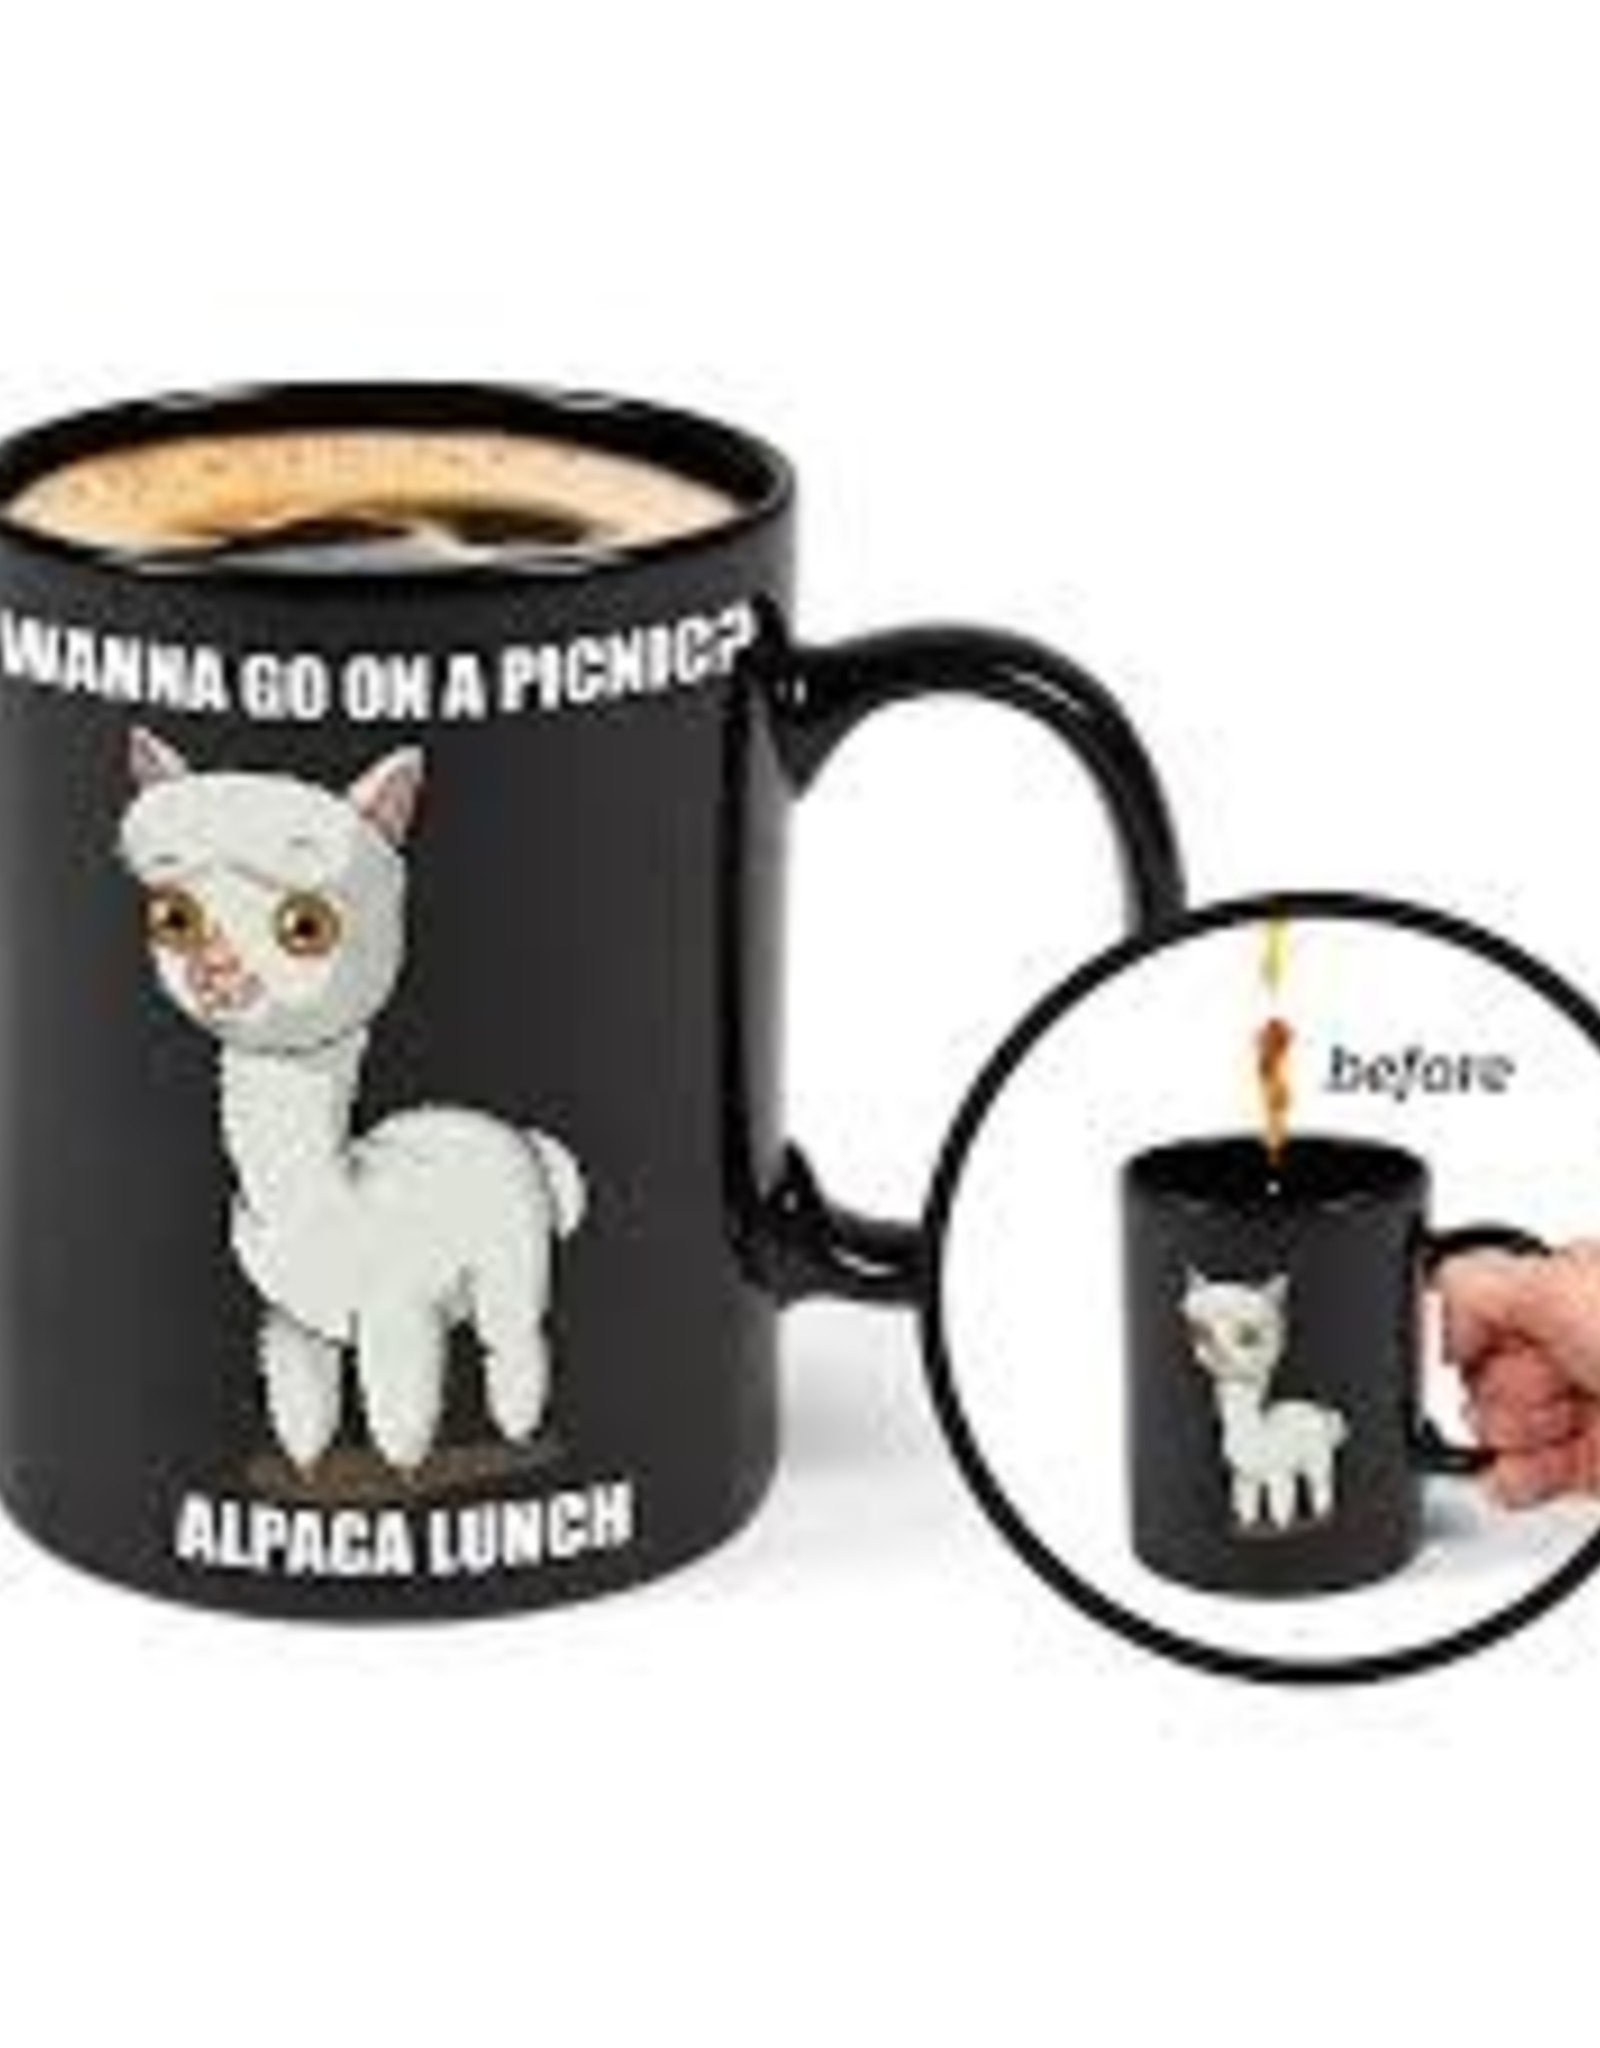 BigMouth Glassware Mystery Mug - Alpaca